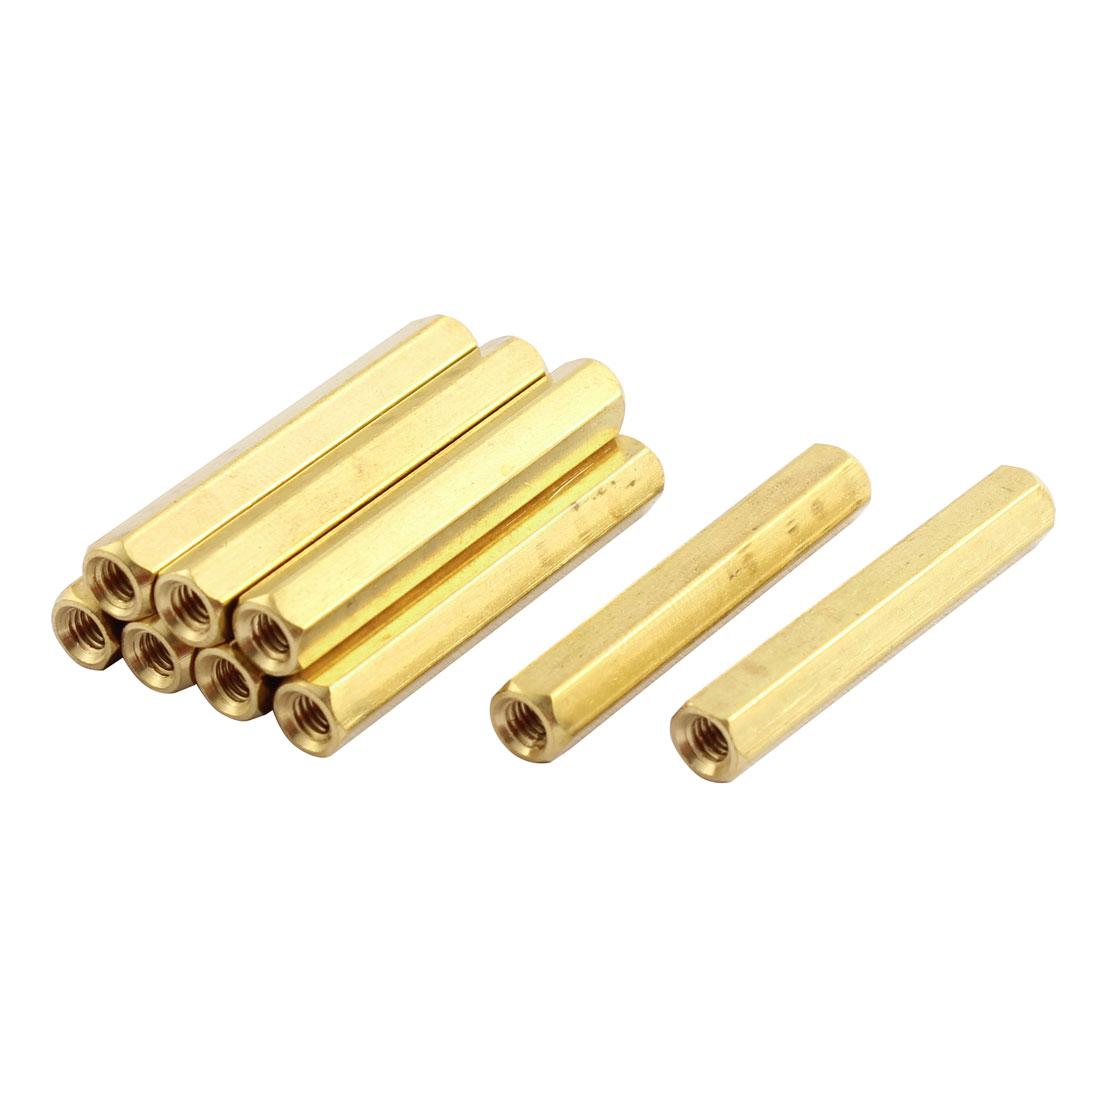 9 Pcs M3 x 30mm Female Brass Spacer Hex Standoff Screw Pillar Gold Tone